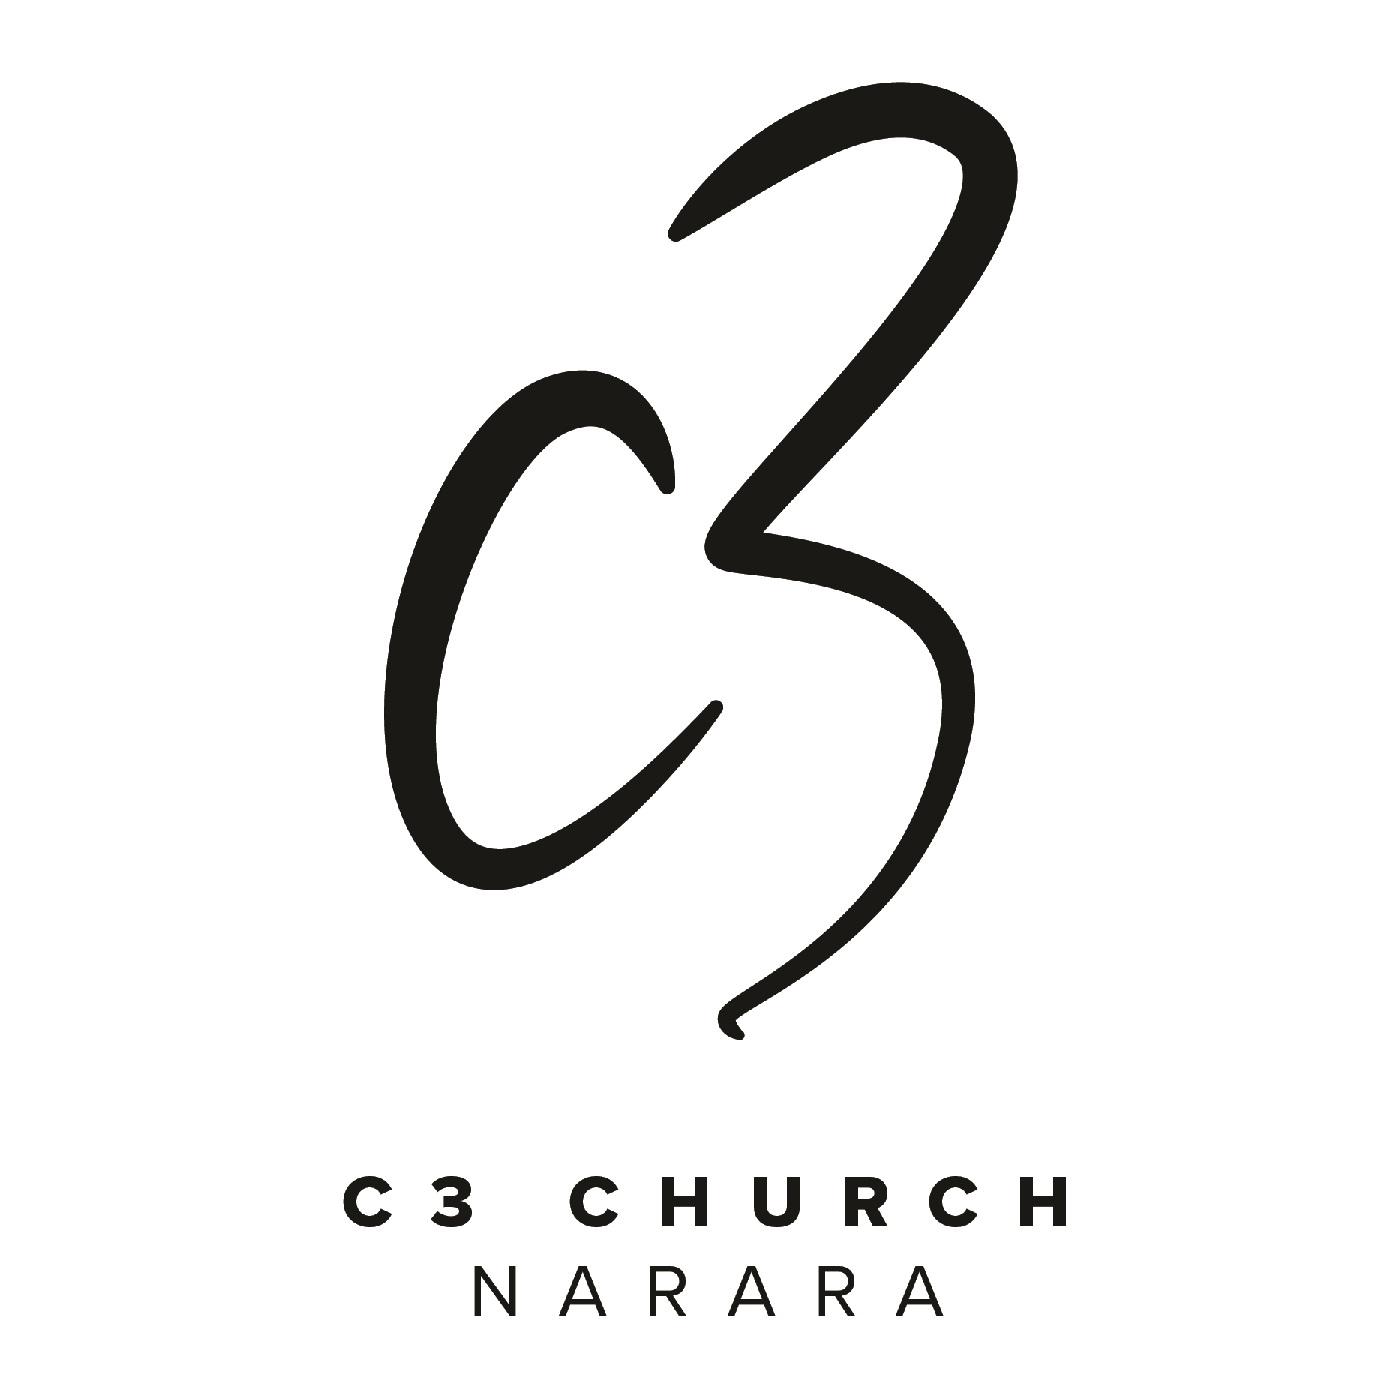 C3 Church - Narara, Central Coast, SermonCast